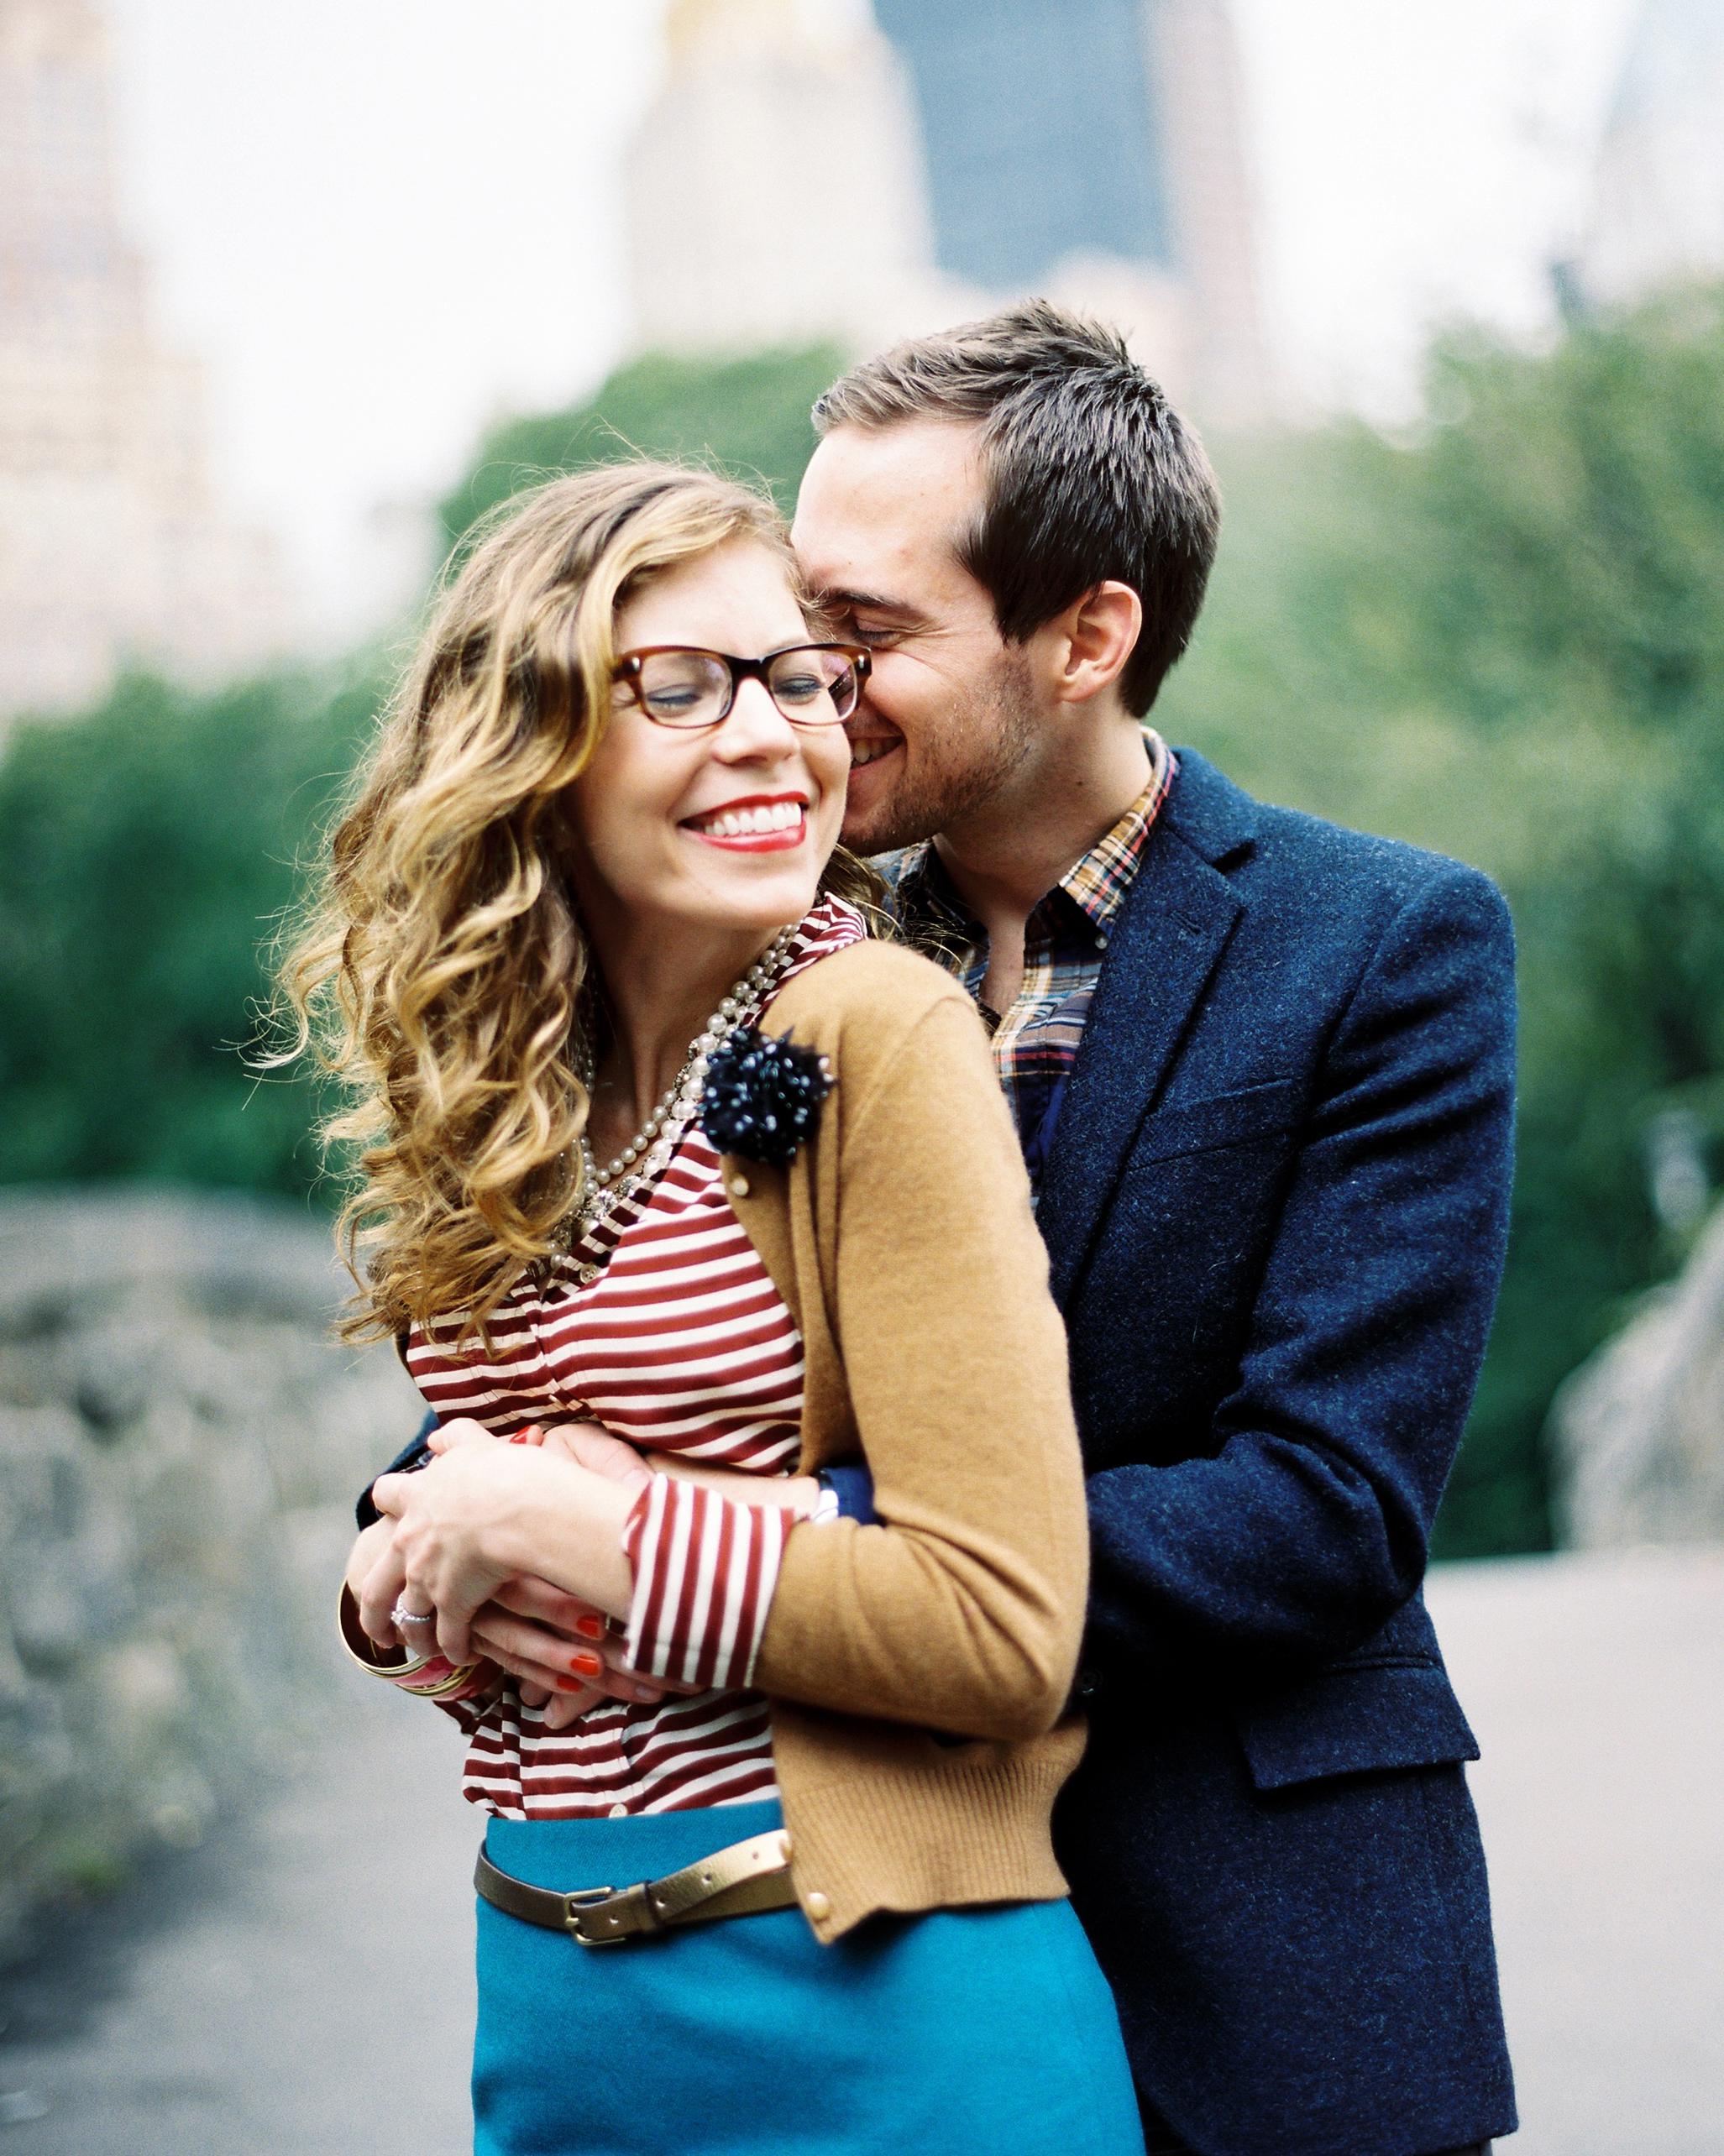 relationship-resolution-mara-danny-blog-about-love-hugging-1214.jpg